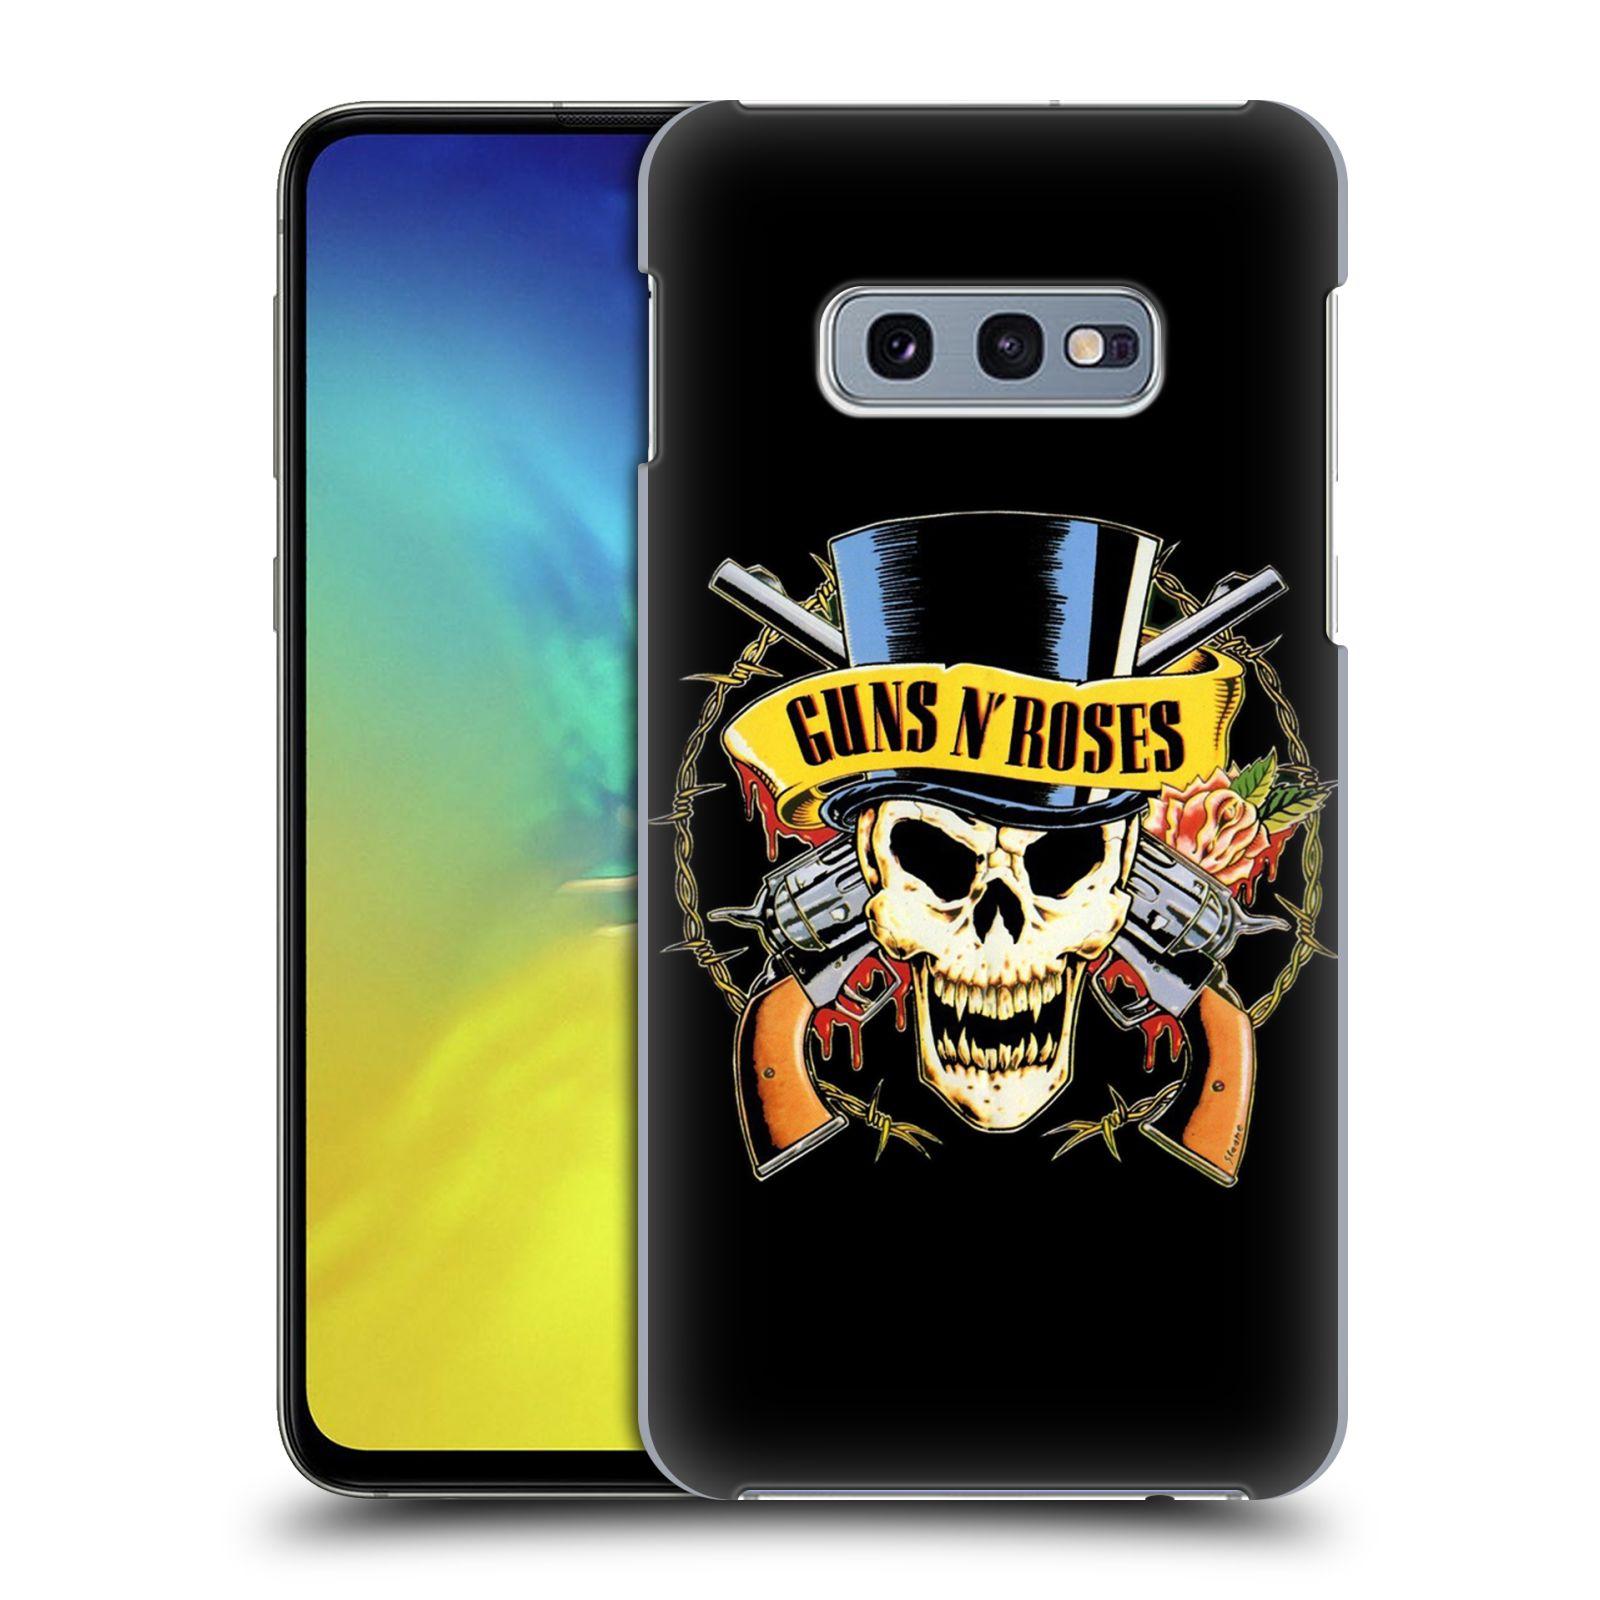 Plastové pouzdro na mobil Samsung Galaxy S10e - Head Case - Guns N' Roses - Lebka